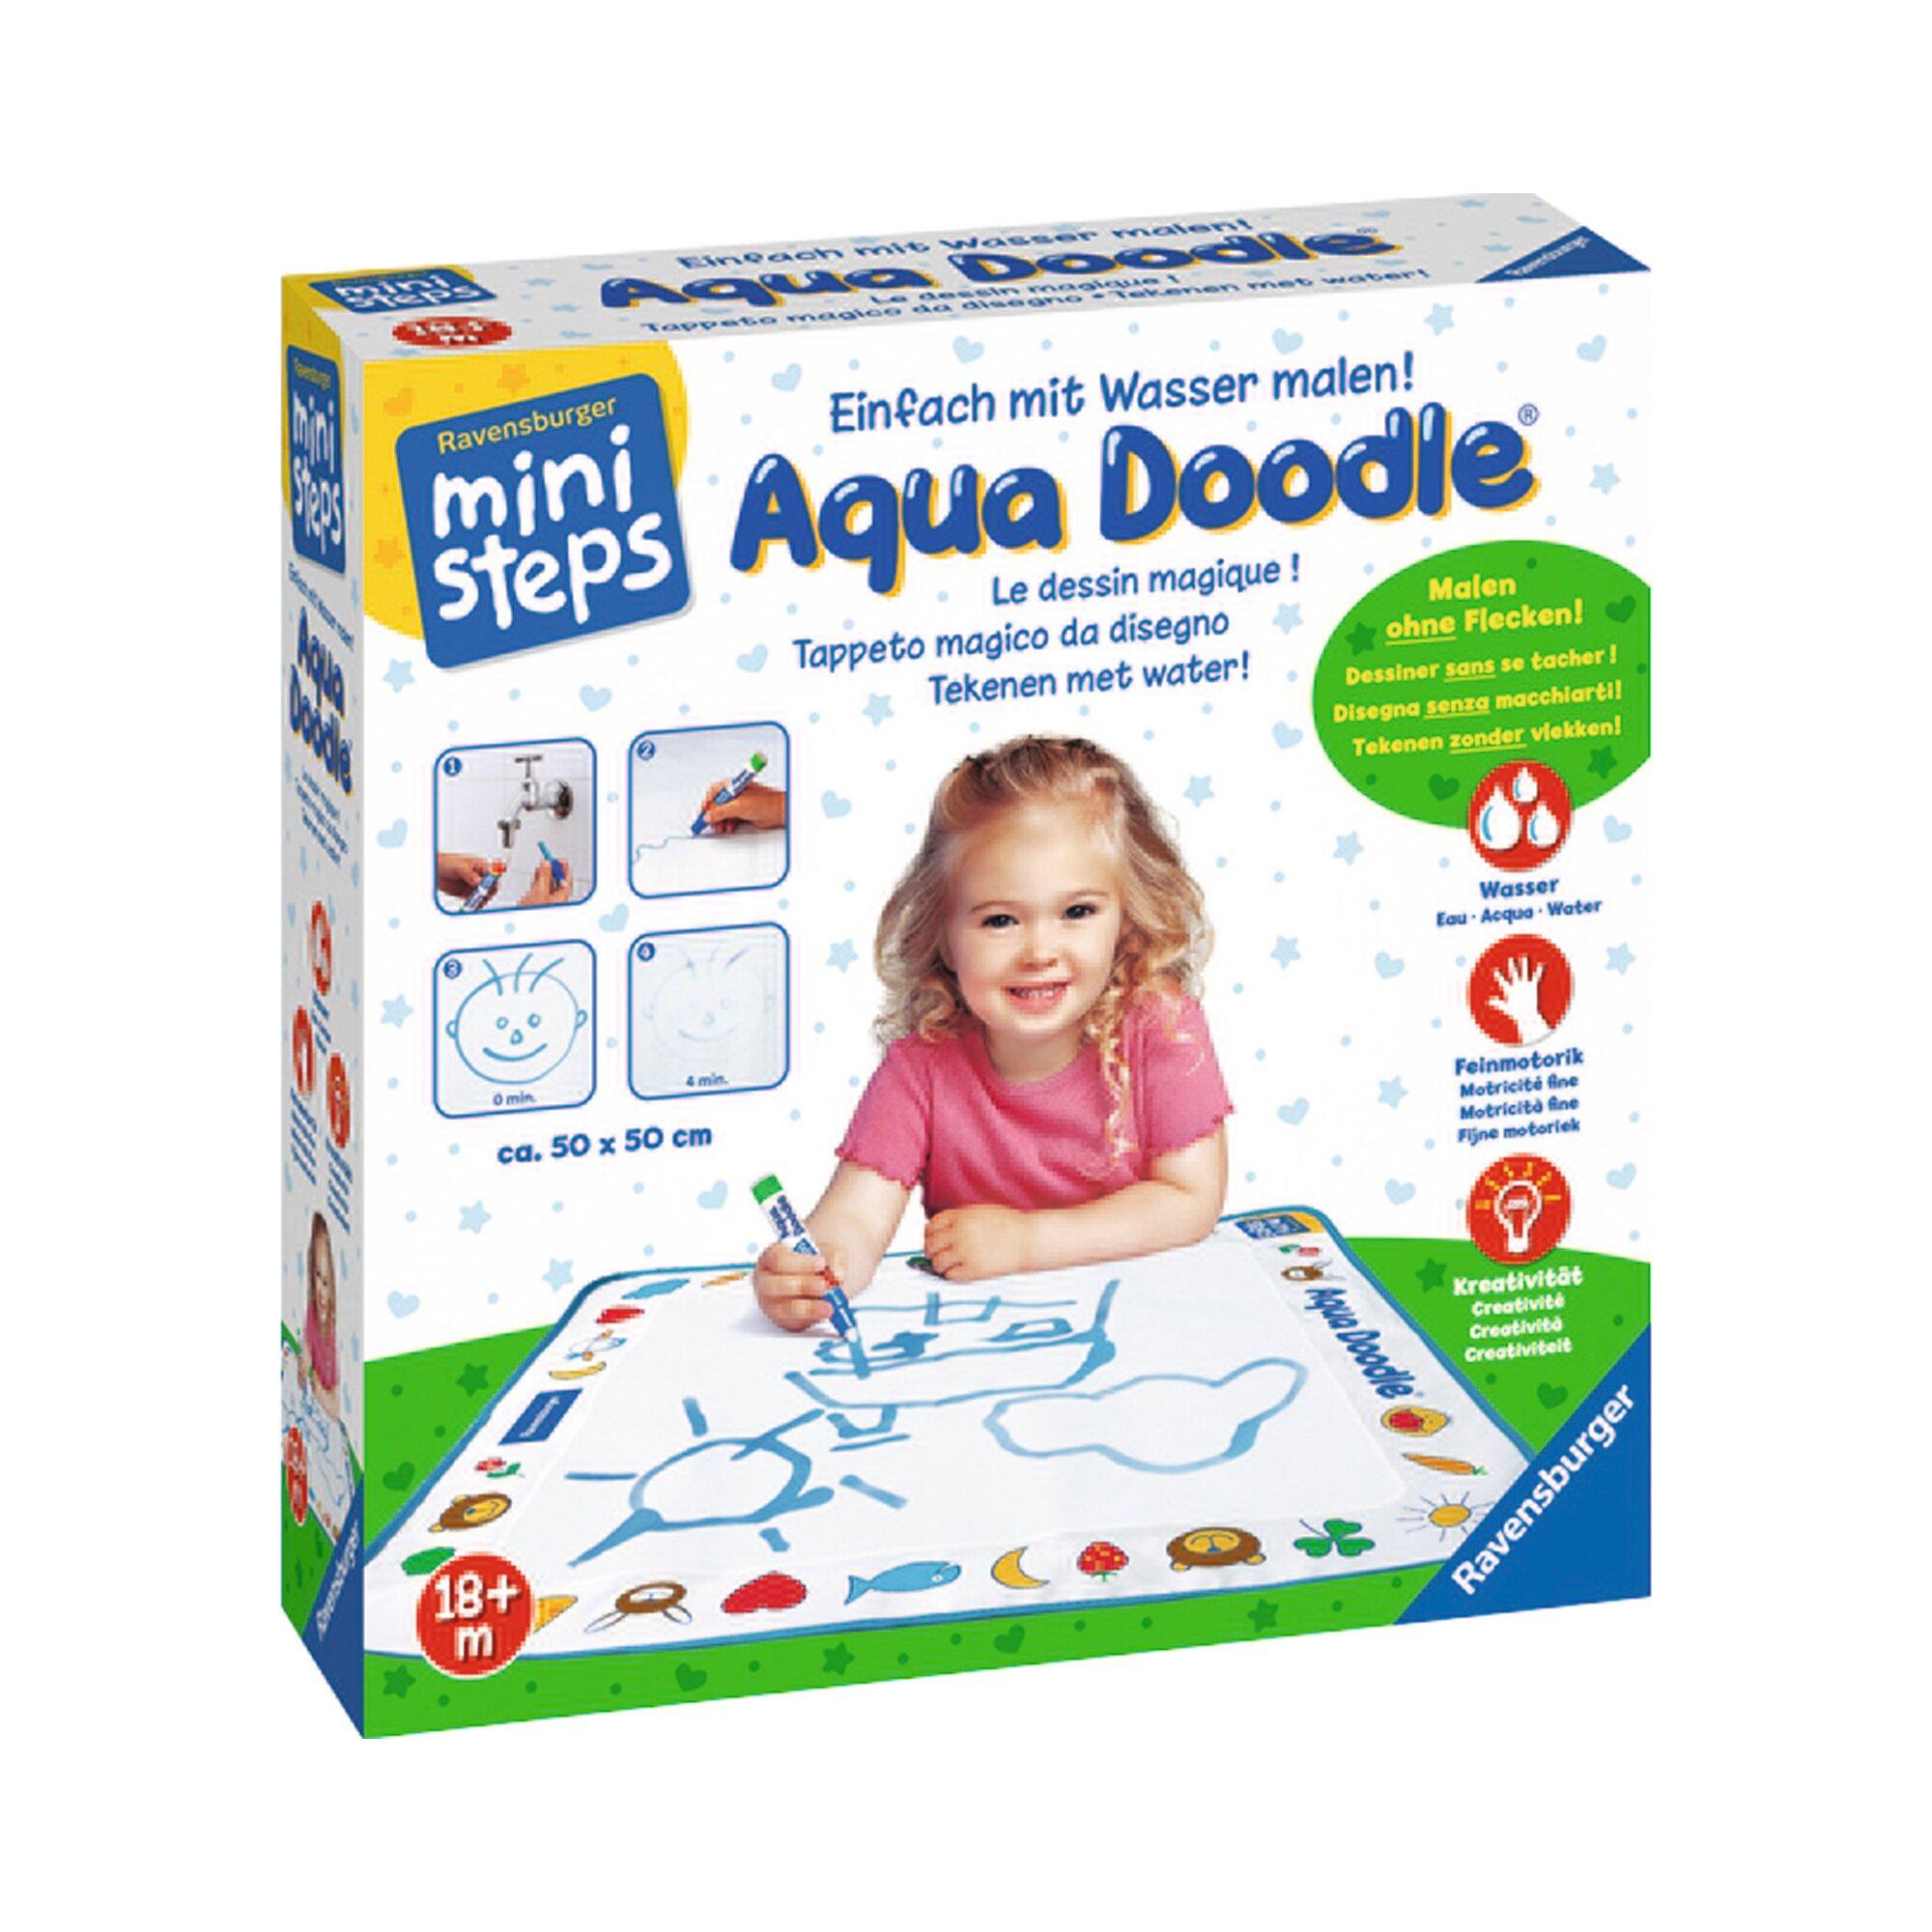 Ministeps Aqua Doodle® Wassermal-Set